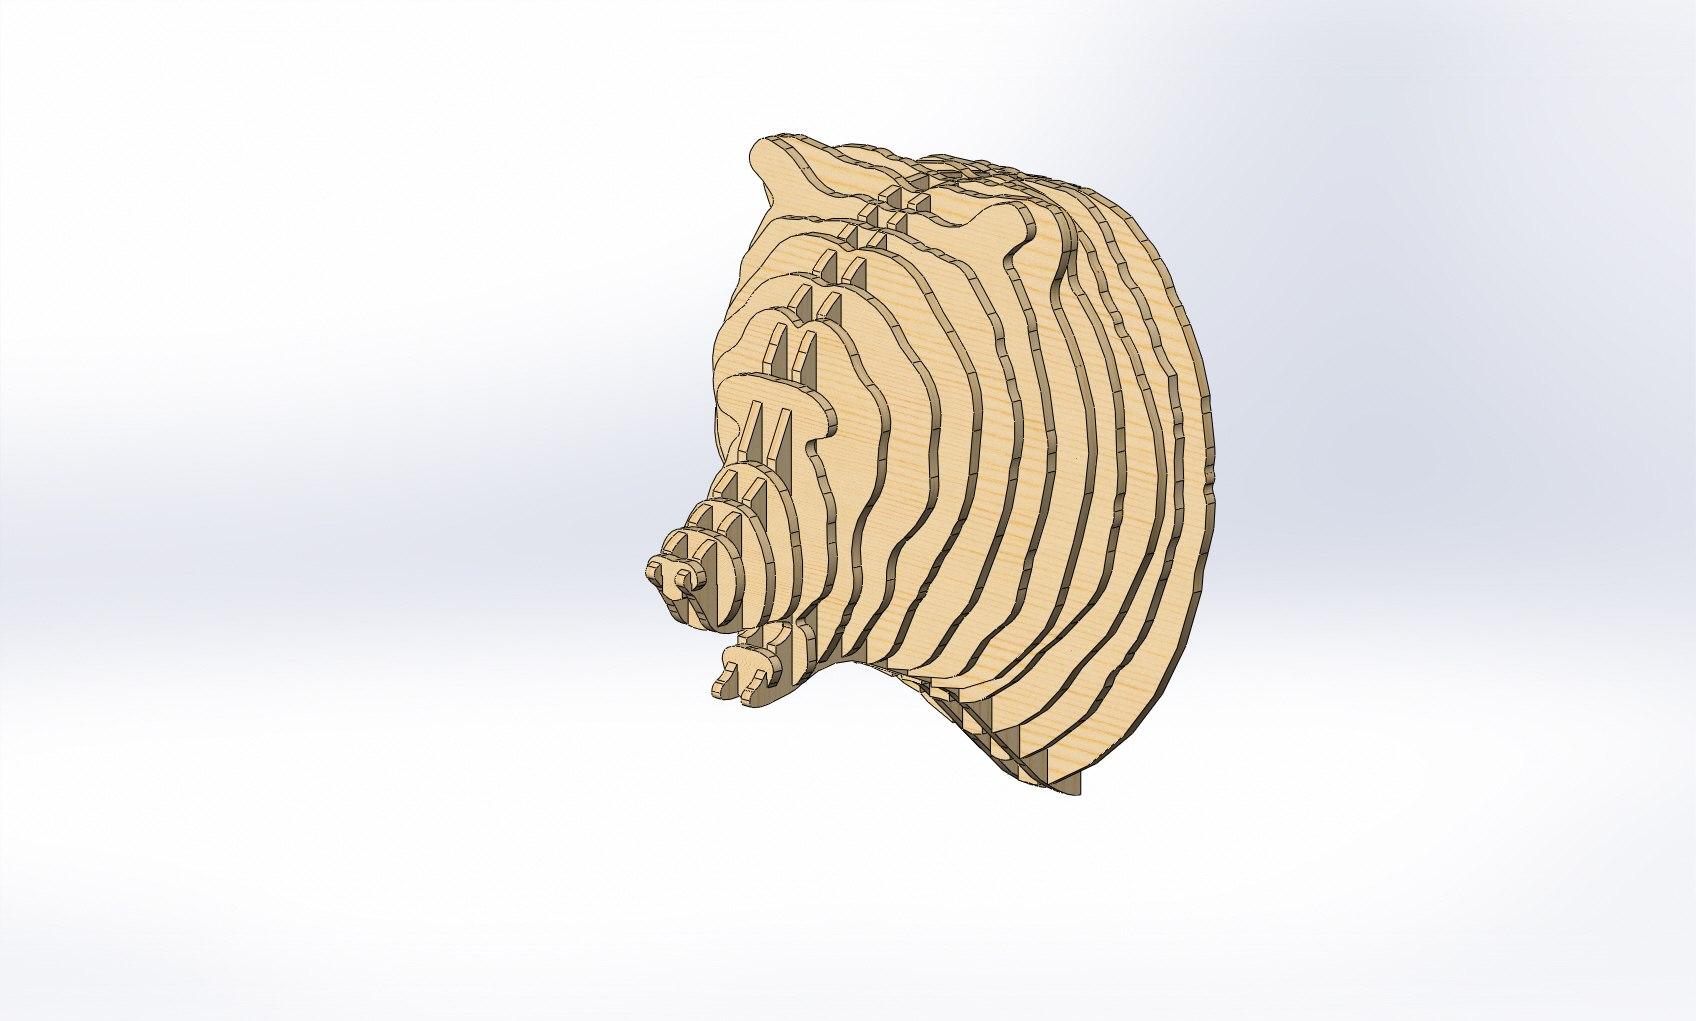 Bear 3D Puzzle Plans Free CDR Vectors Art